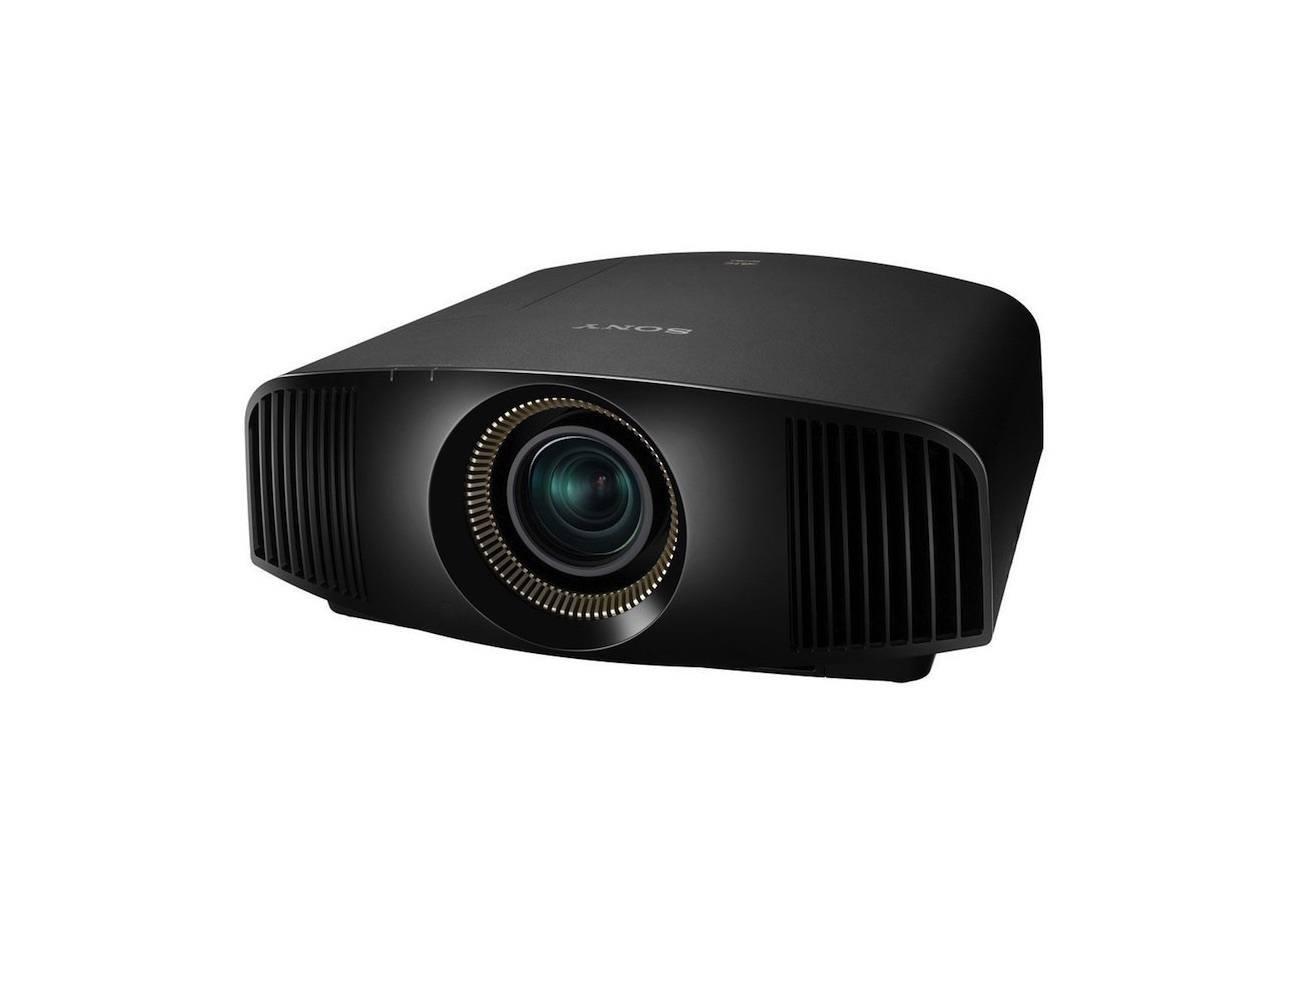 Sony VPL-VW675ES 4K Projector